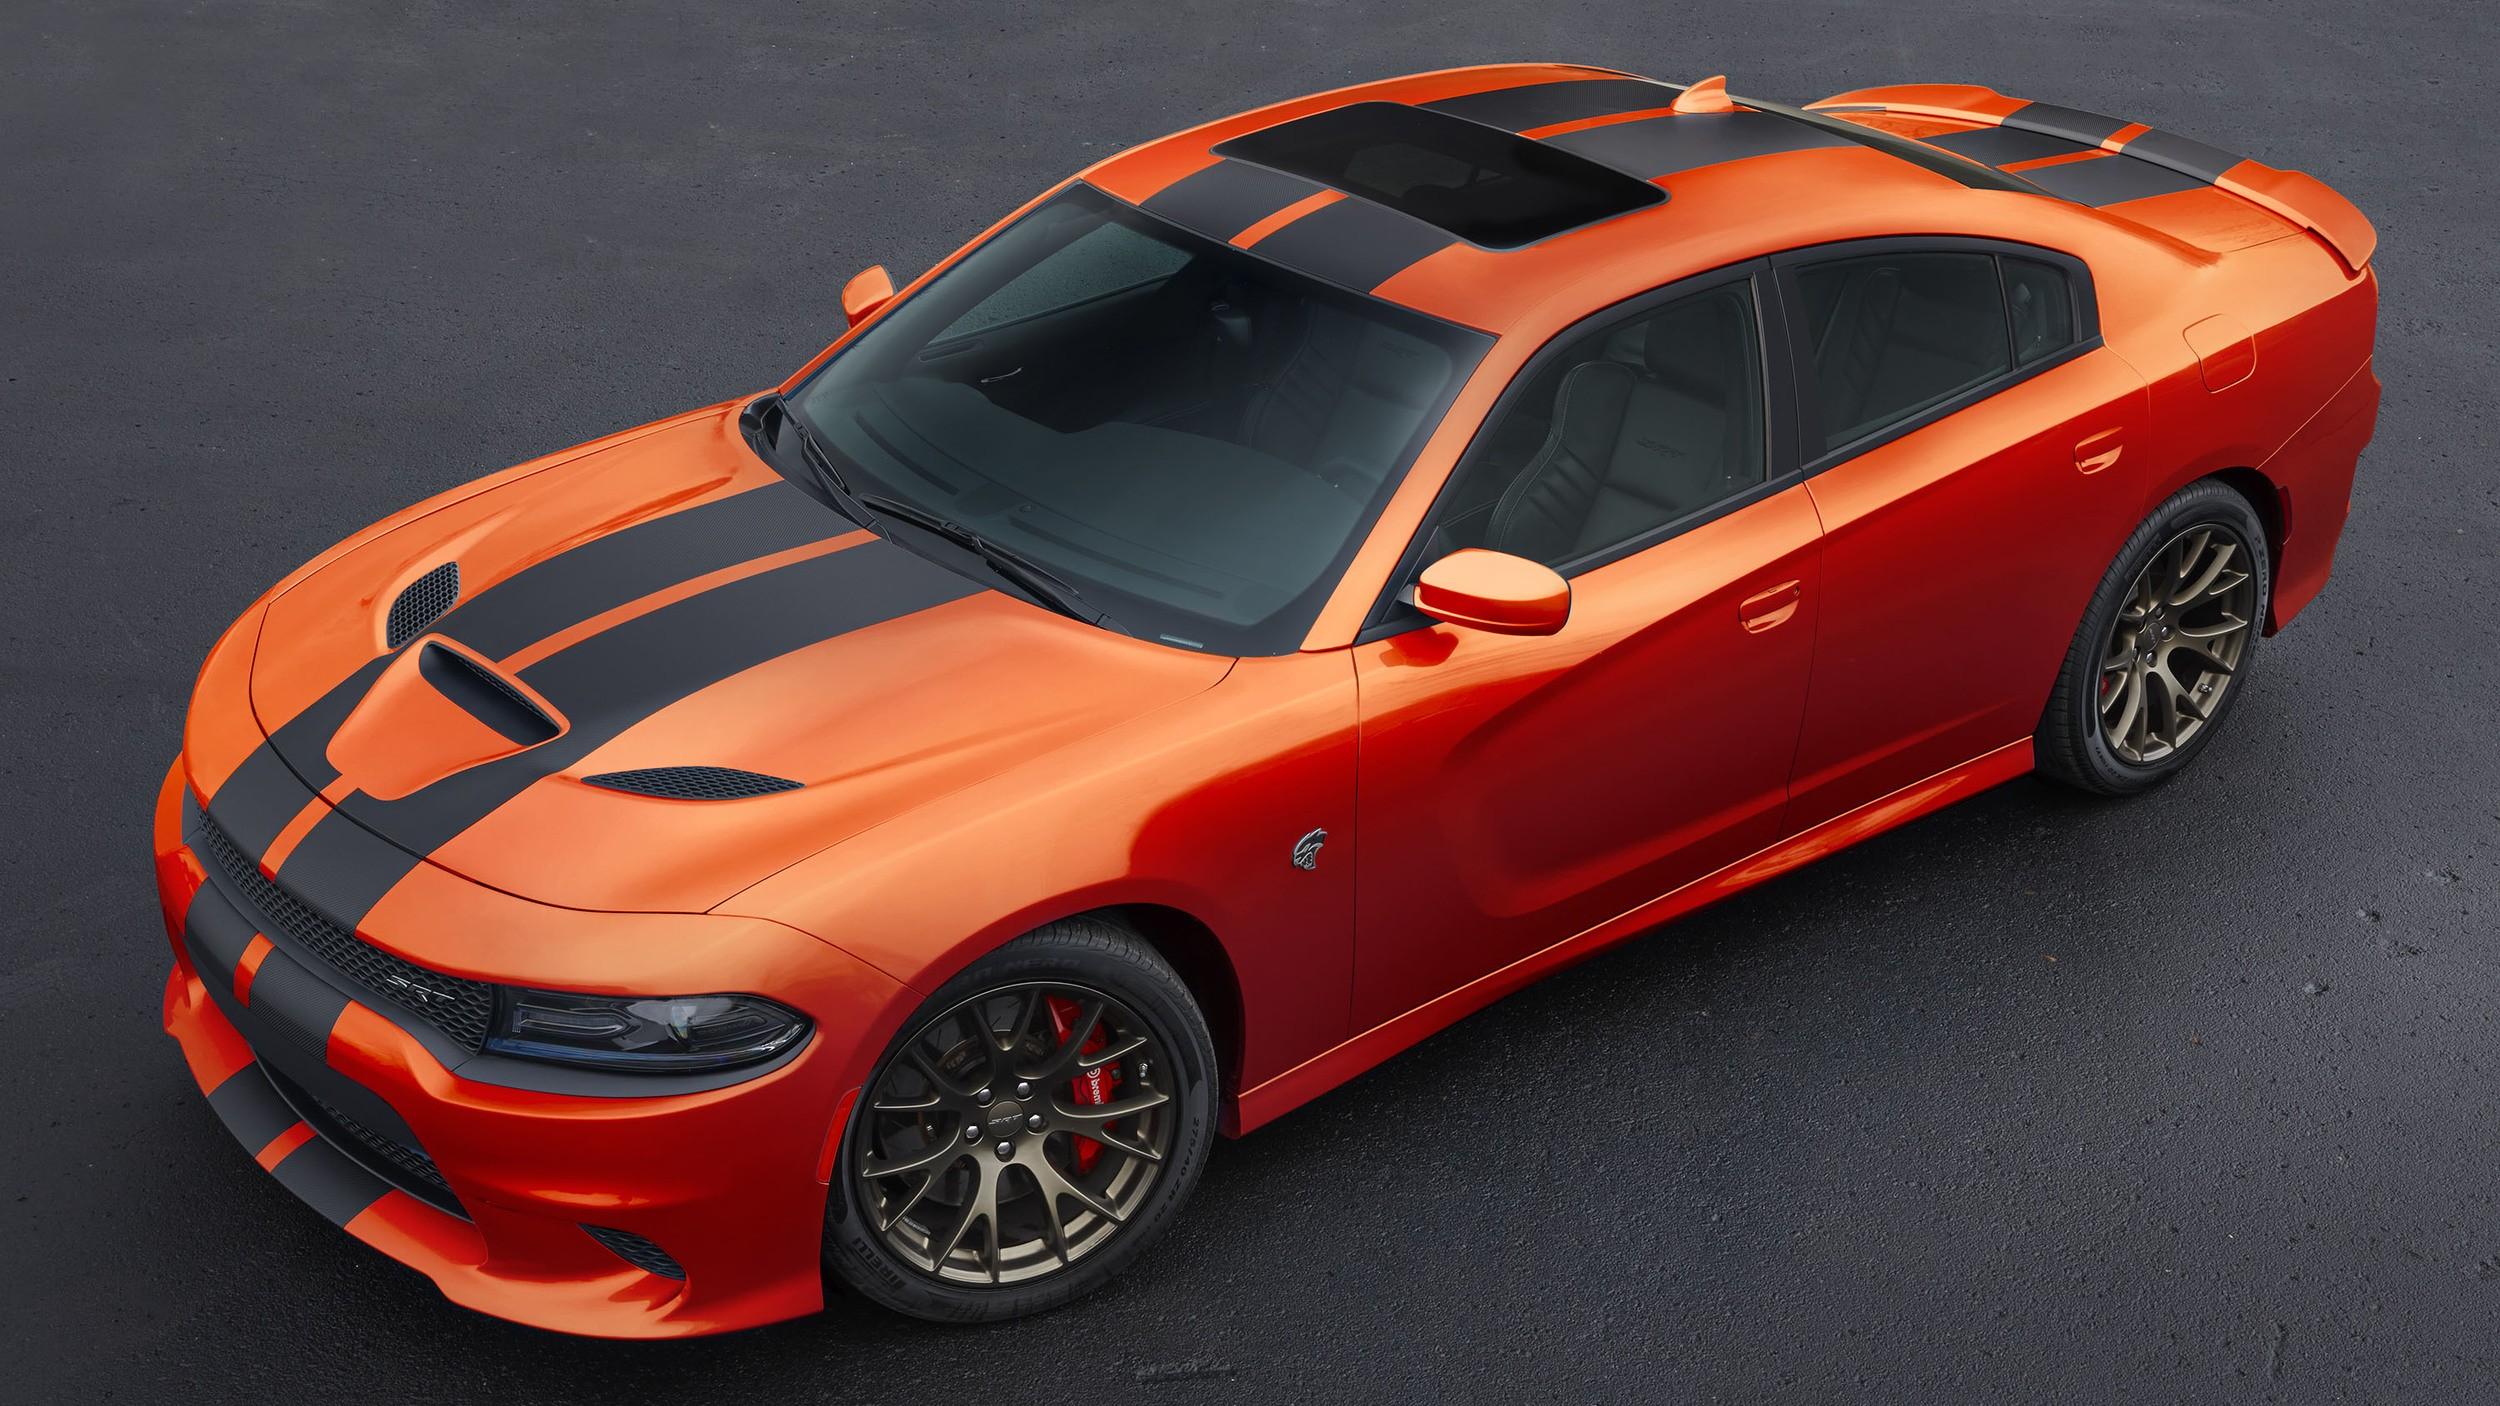 charger dodge challenger mango go paint regular orange cool hellcat srt autoevolution hemi